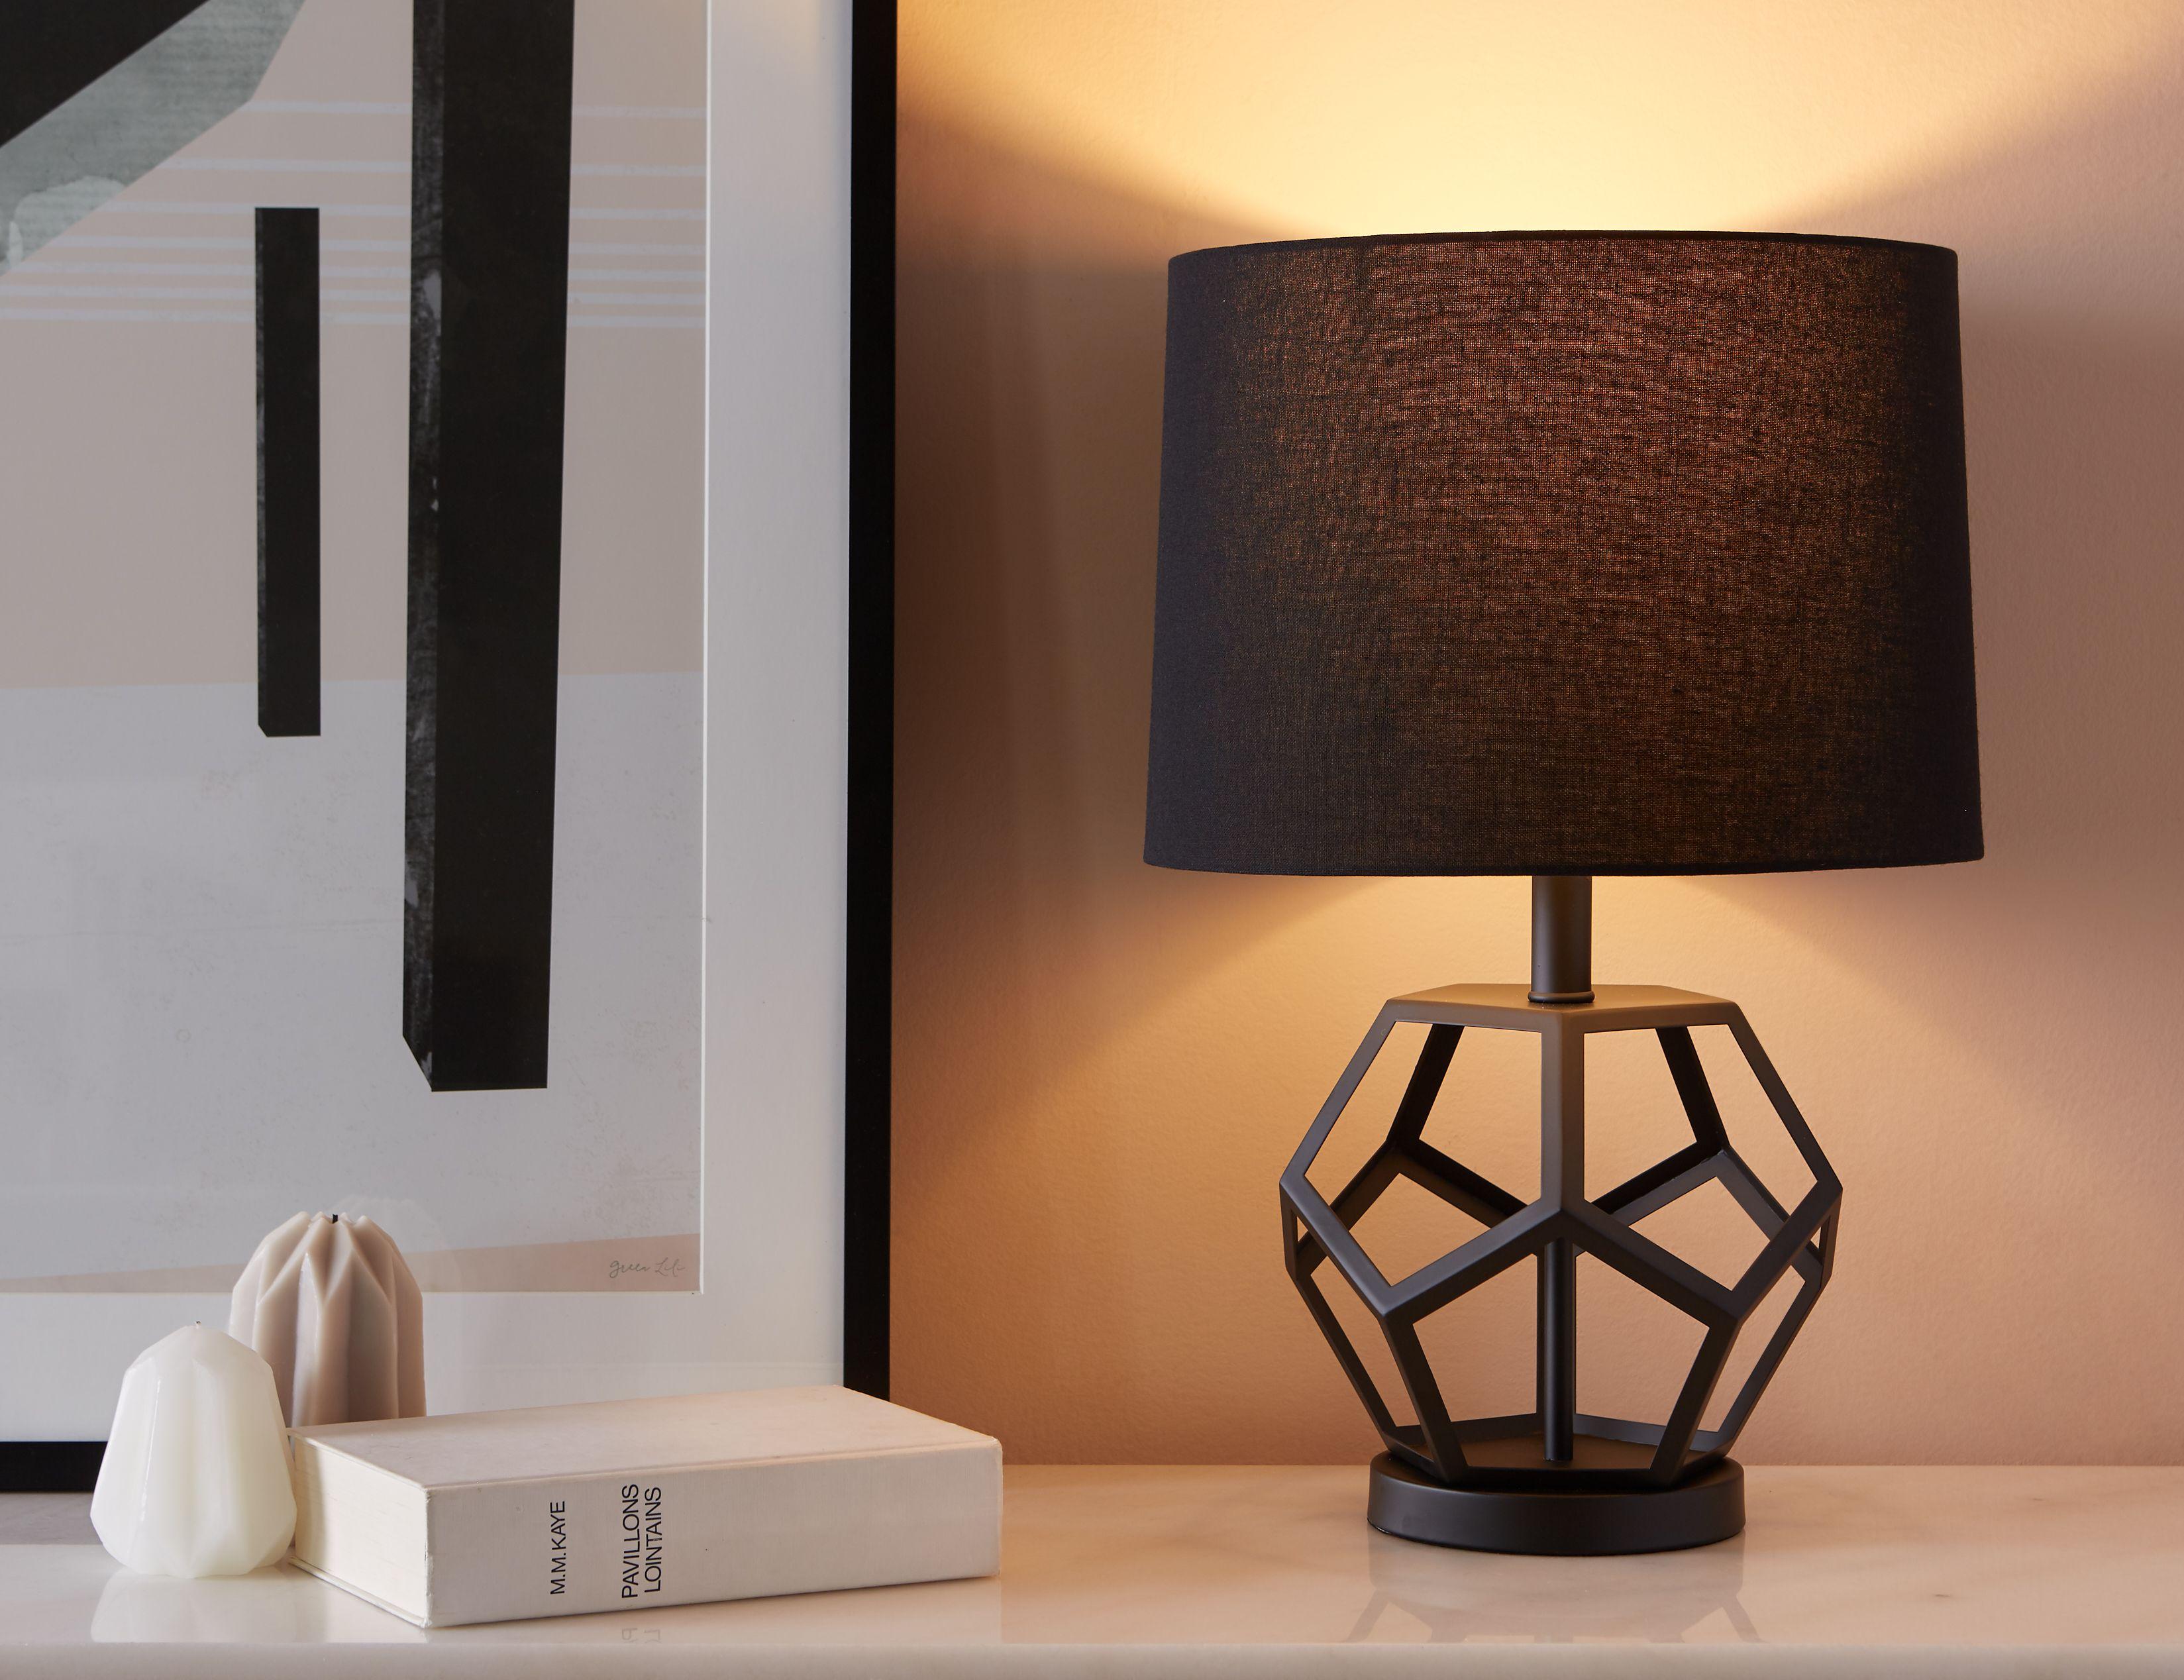 Black Table Lamp 54cm Height 22 Quot Structube Lea Black Table Lamps Table Lamp